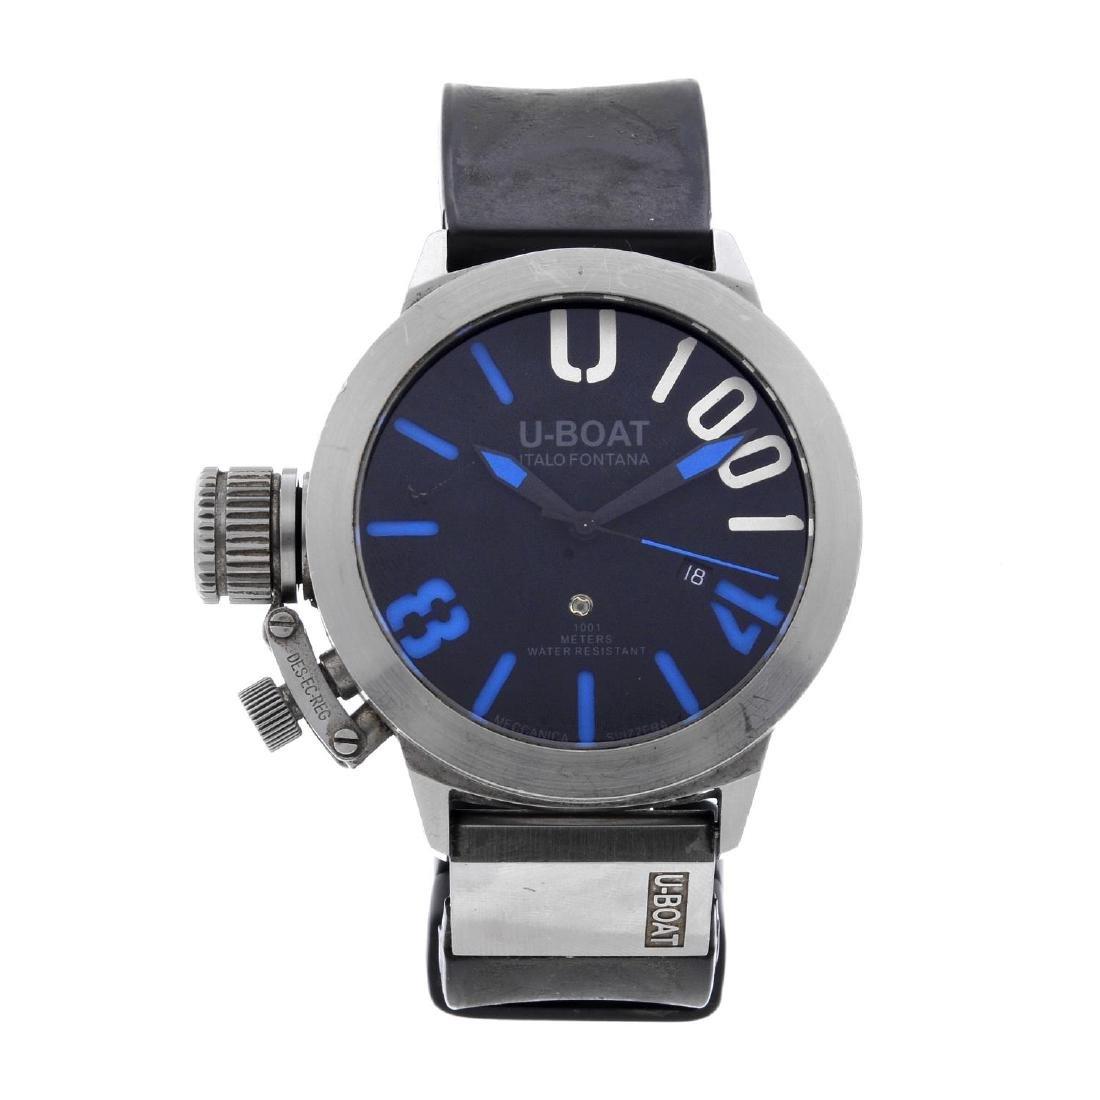 U-BOAT - a limited edition gentleman's U-1001 wrist